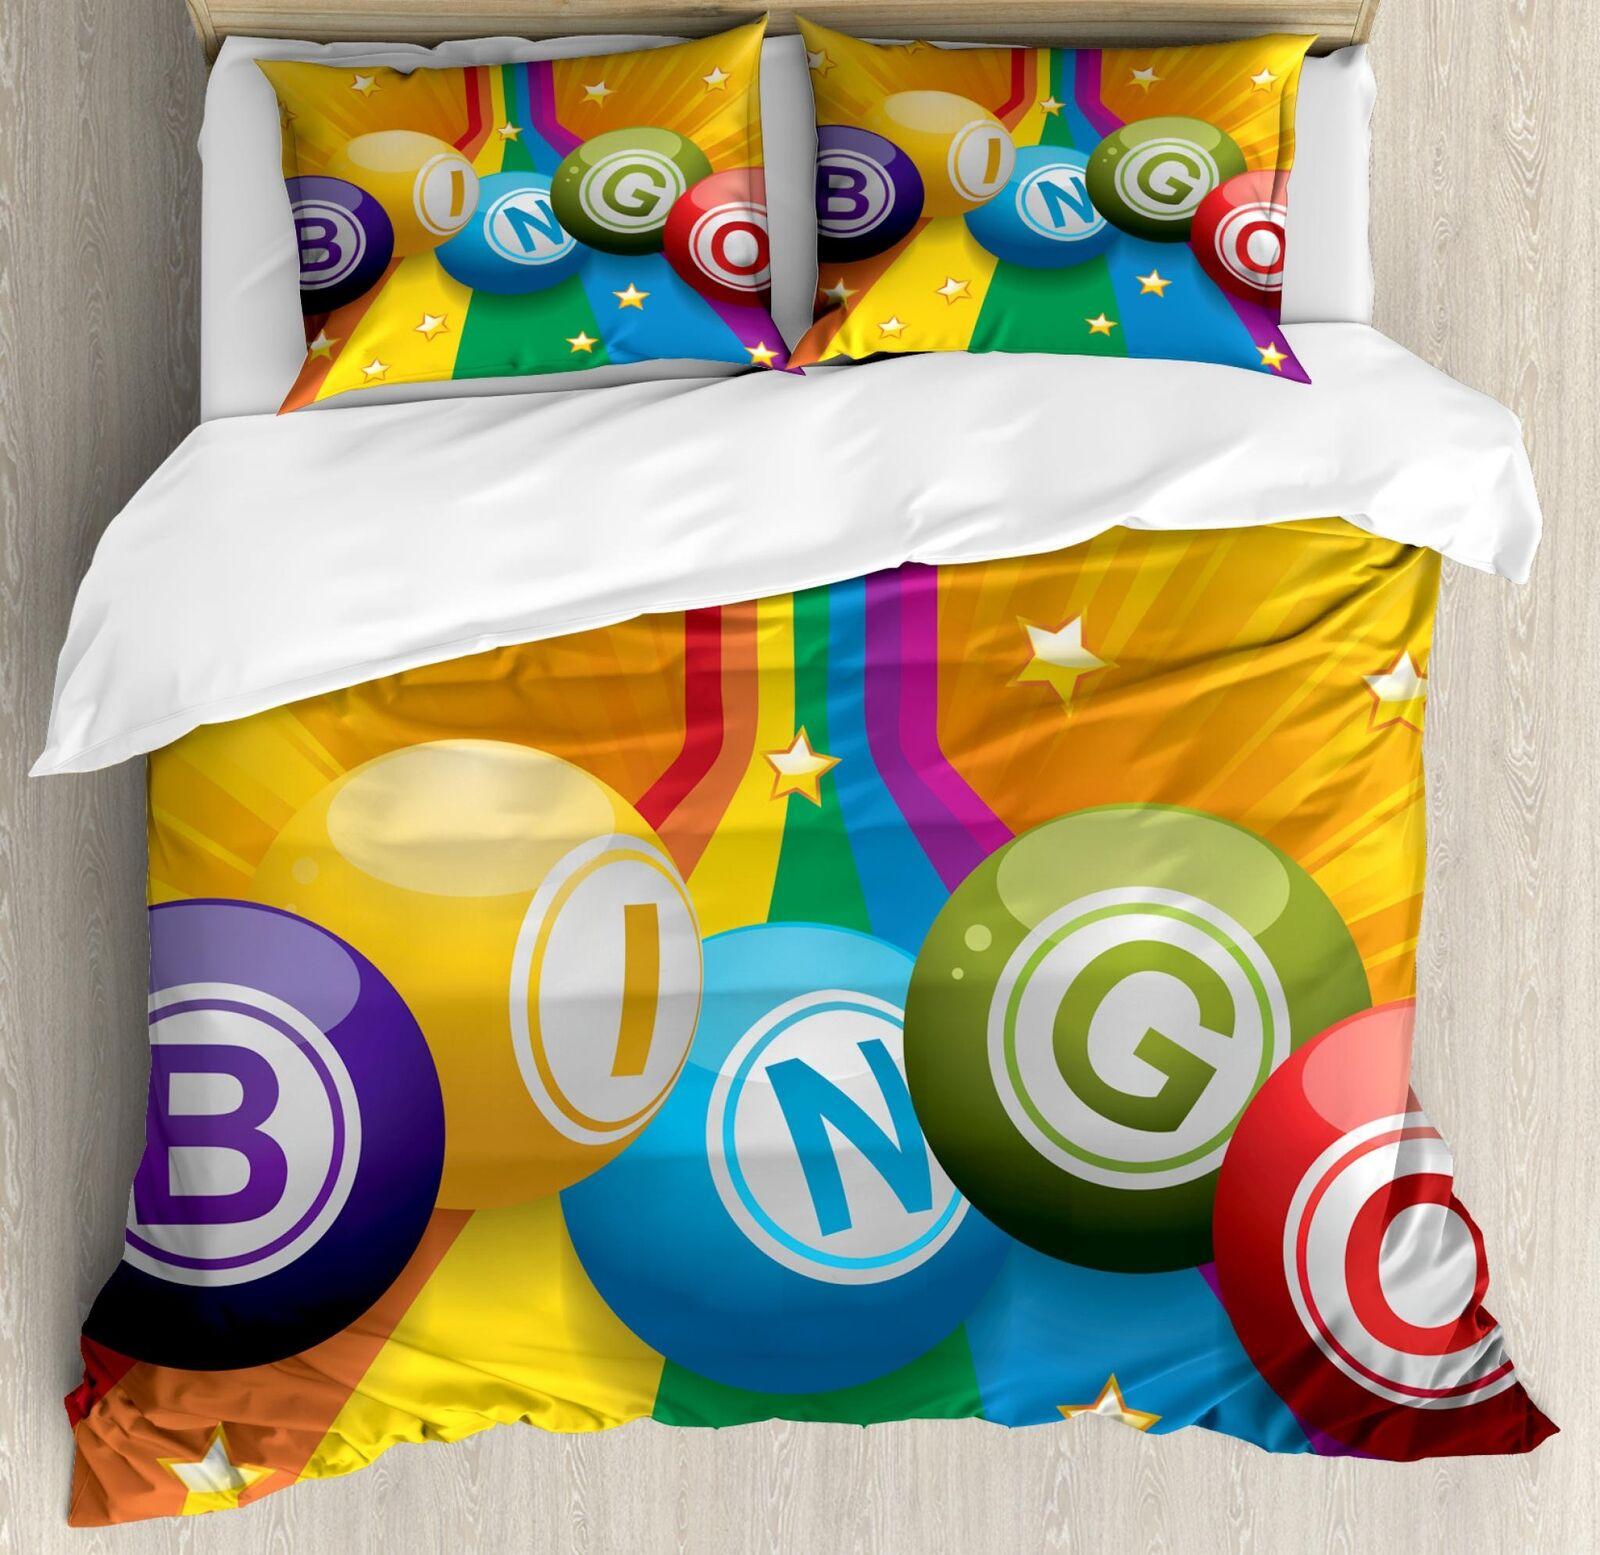 Bingo Duvet Cover Set Twin Queen King Größes with Pillow Shams